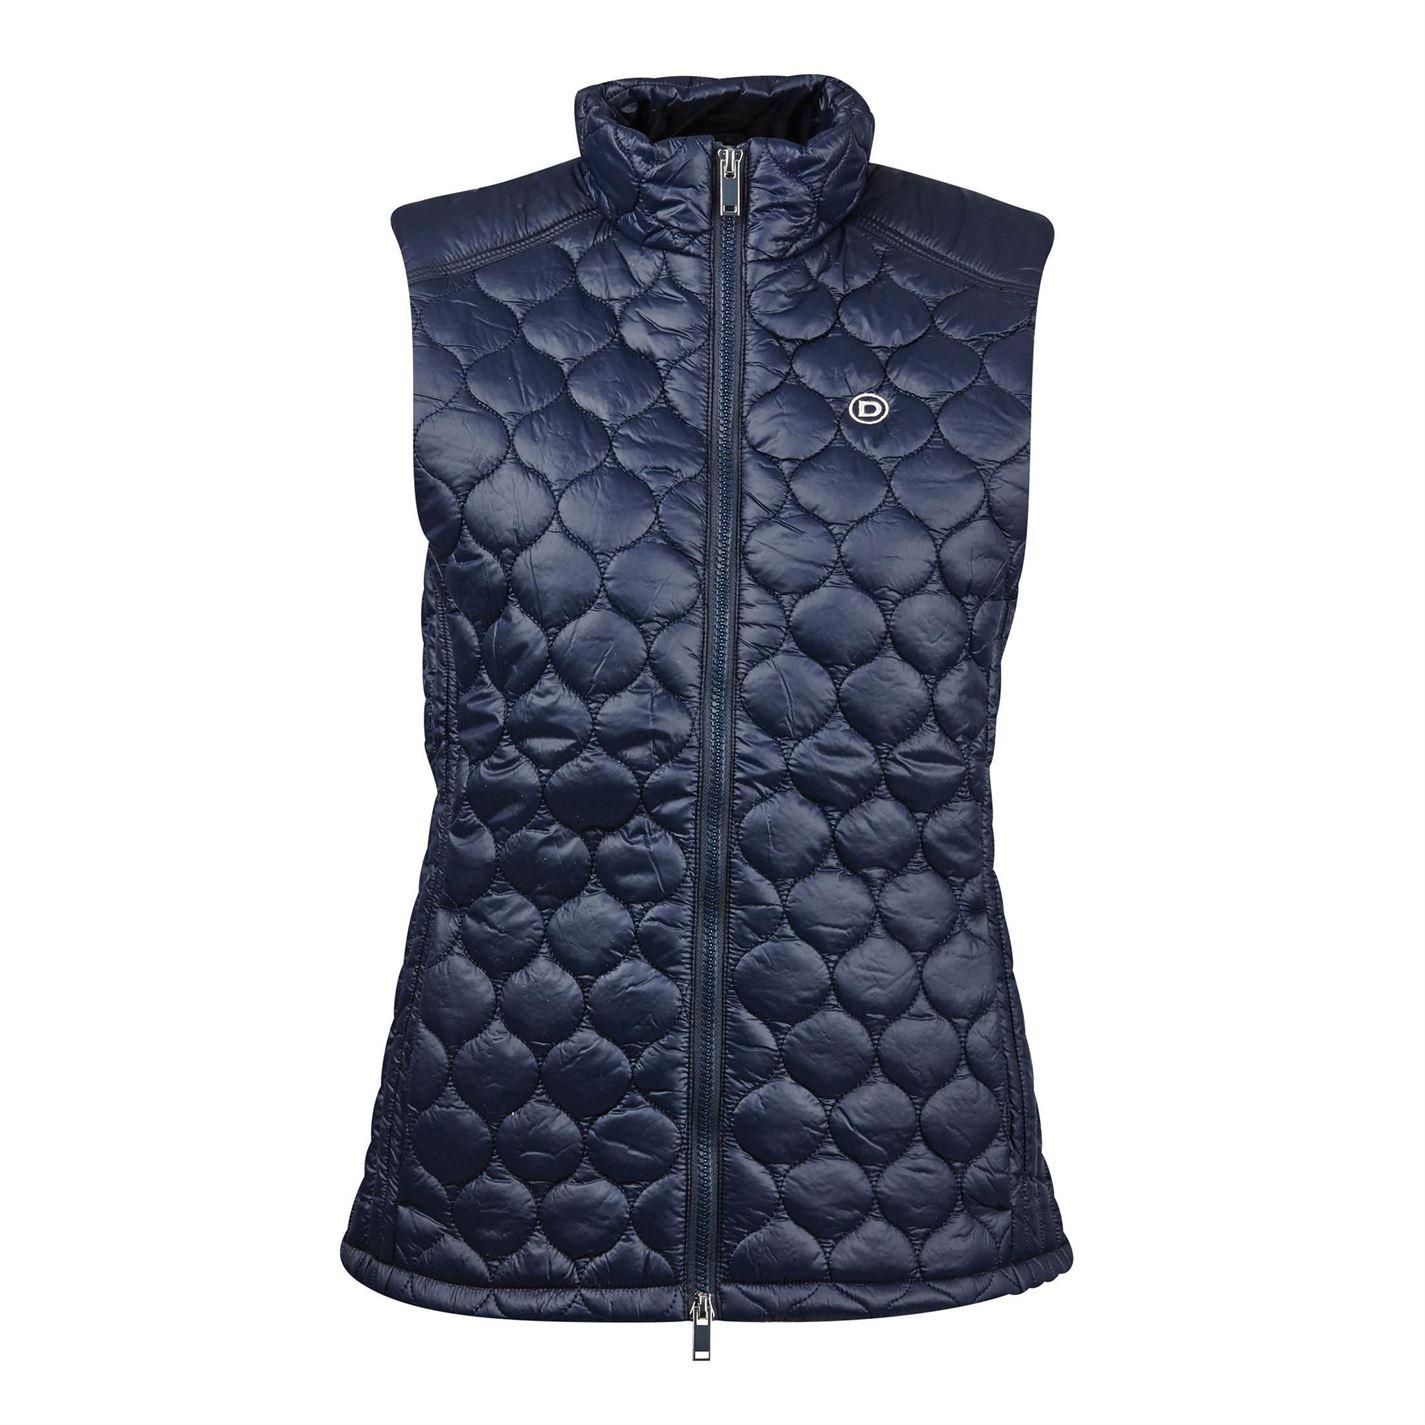 Zip Sapia Mouwloze Vest Dublin Navy Gilet Dames mouwloze jas 7Pqn6z